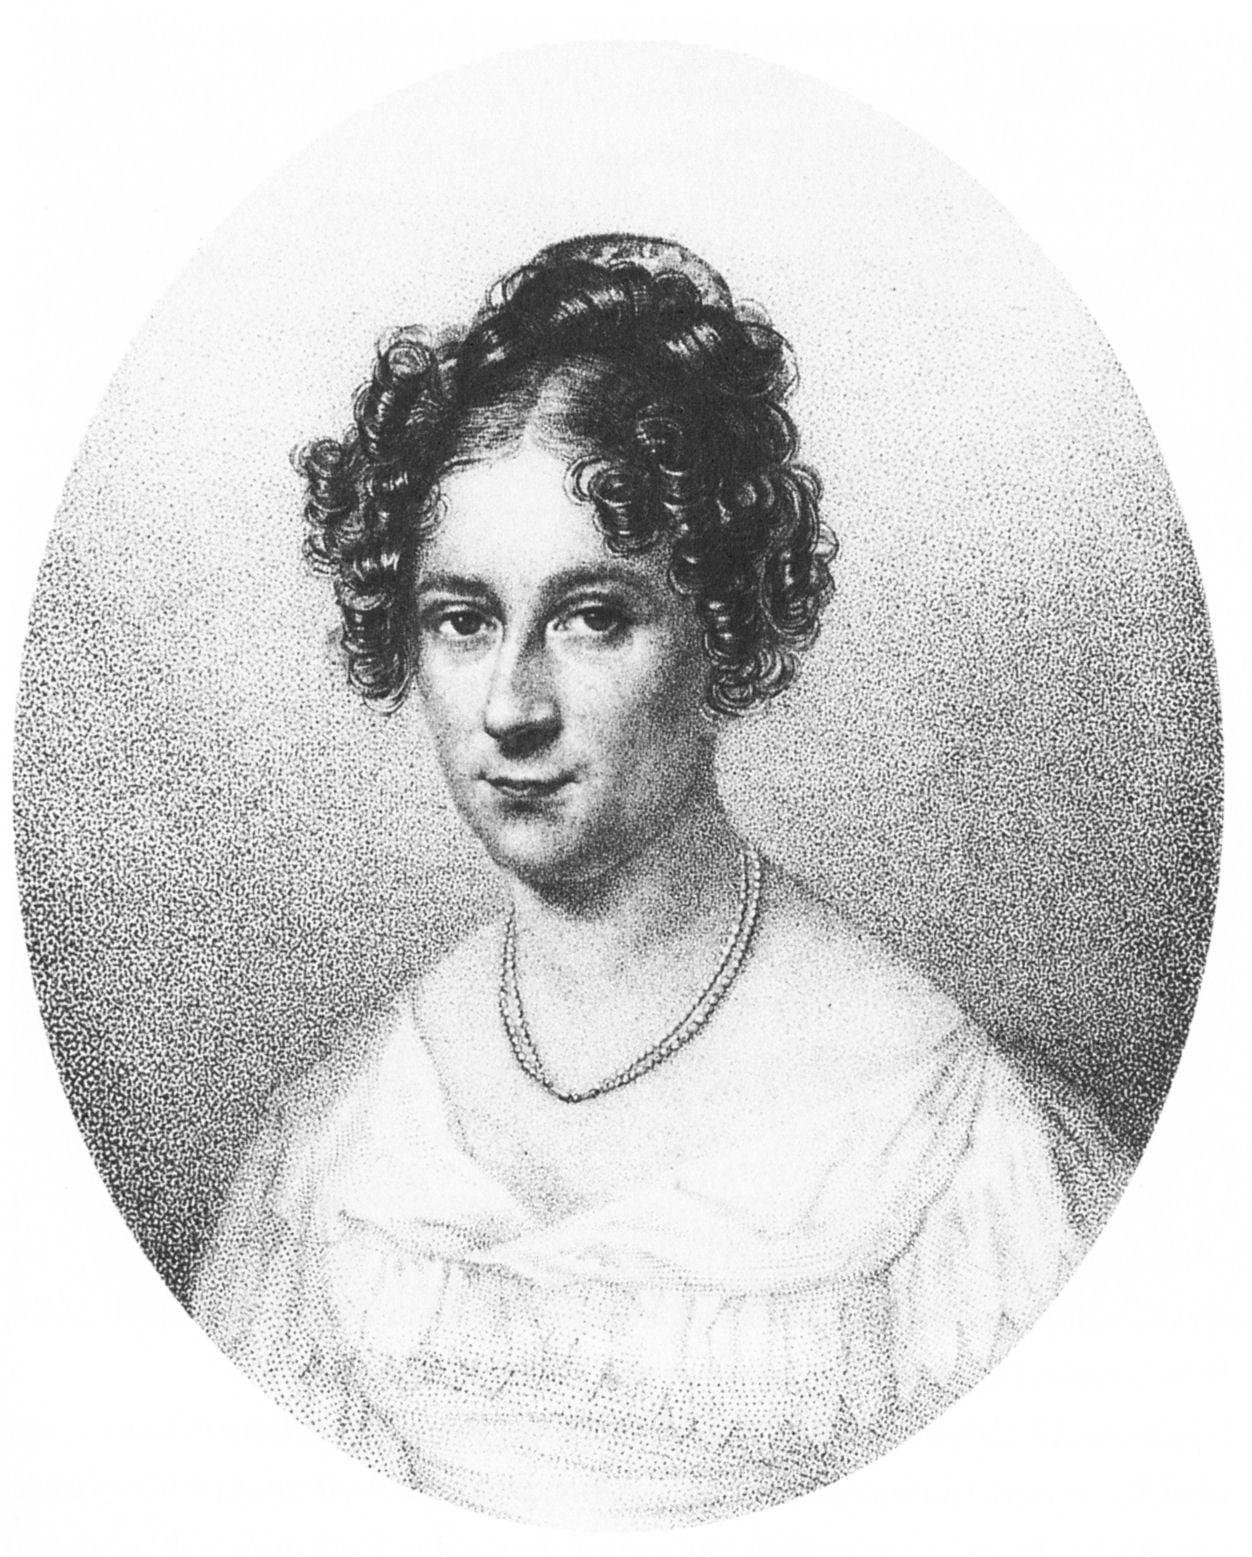 Rahel Levin Varnhagen (1771-1833), intellectual and salonniere. She converted to Christianity in 1814, before marrying Karl August Varnhagen von Ense.